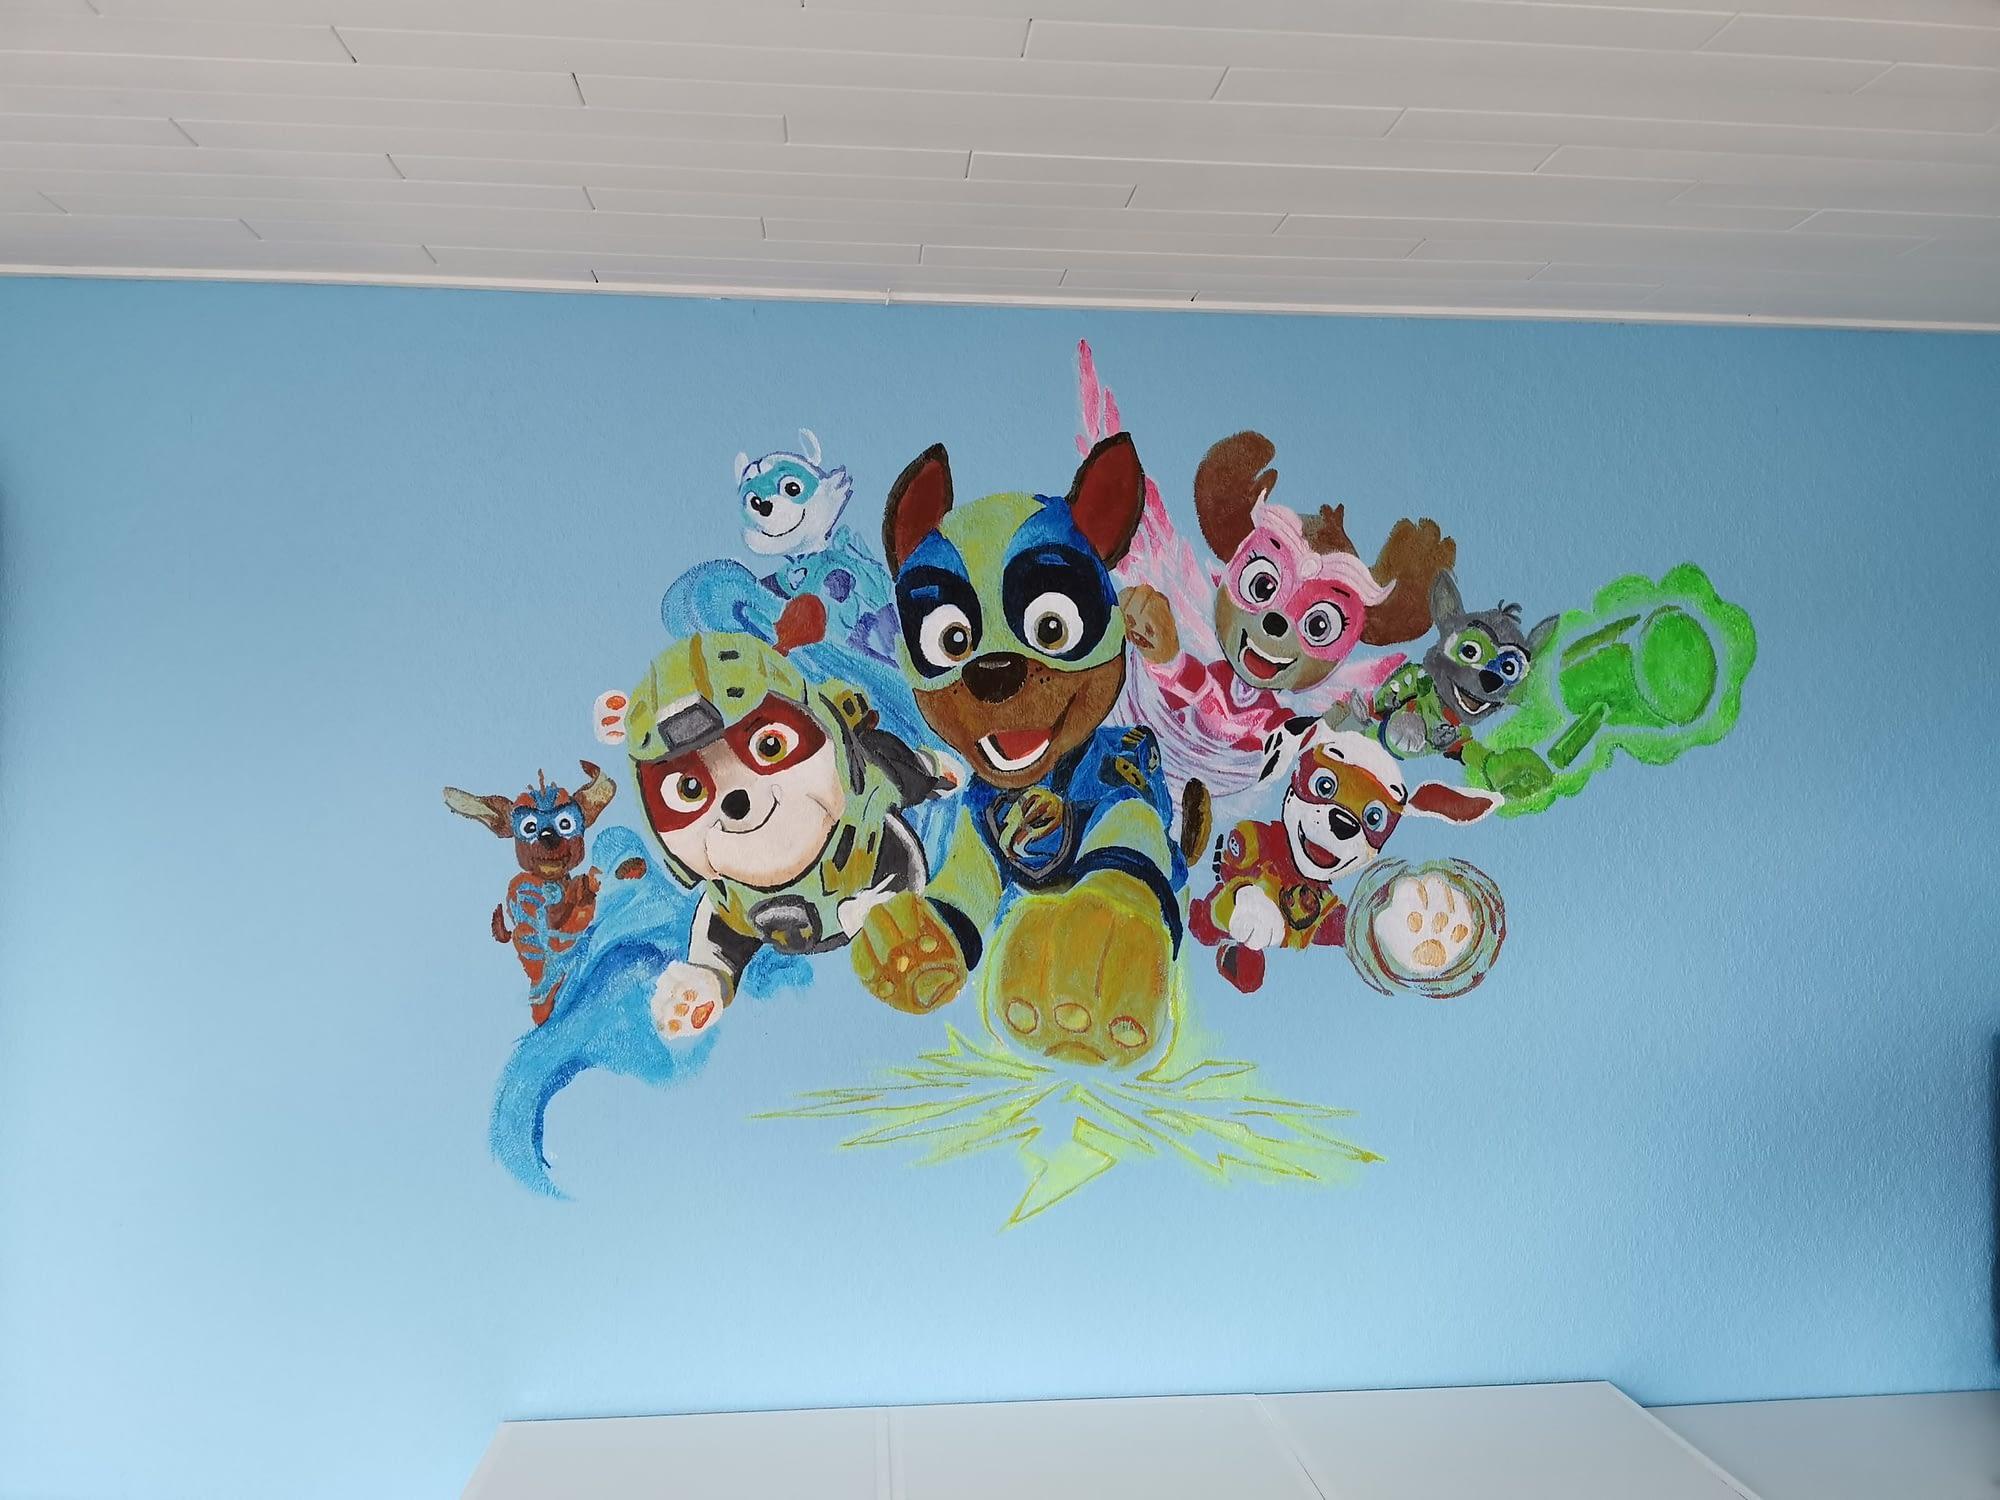 Paw patrol mighty pups muurschildering